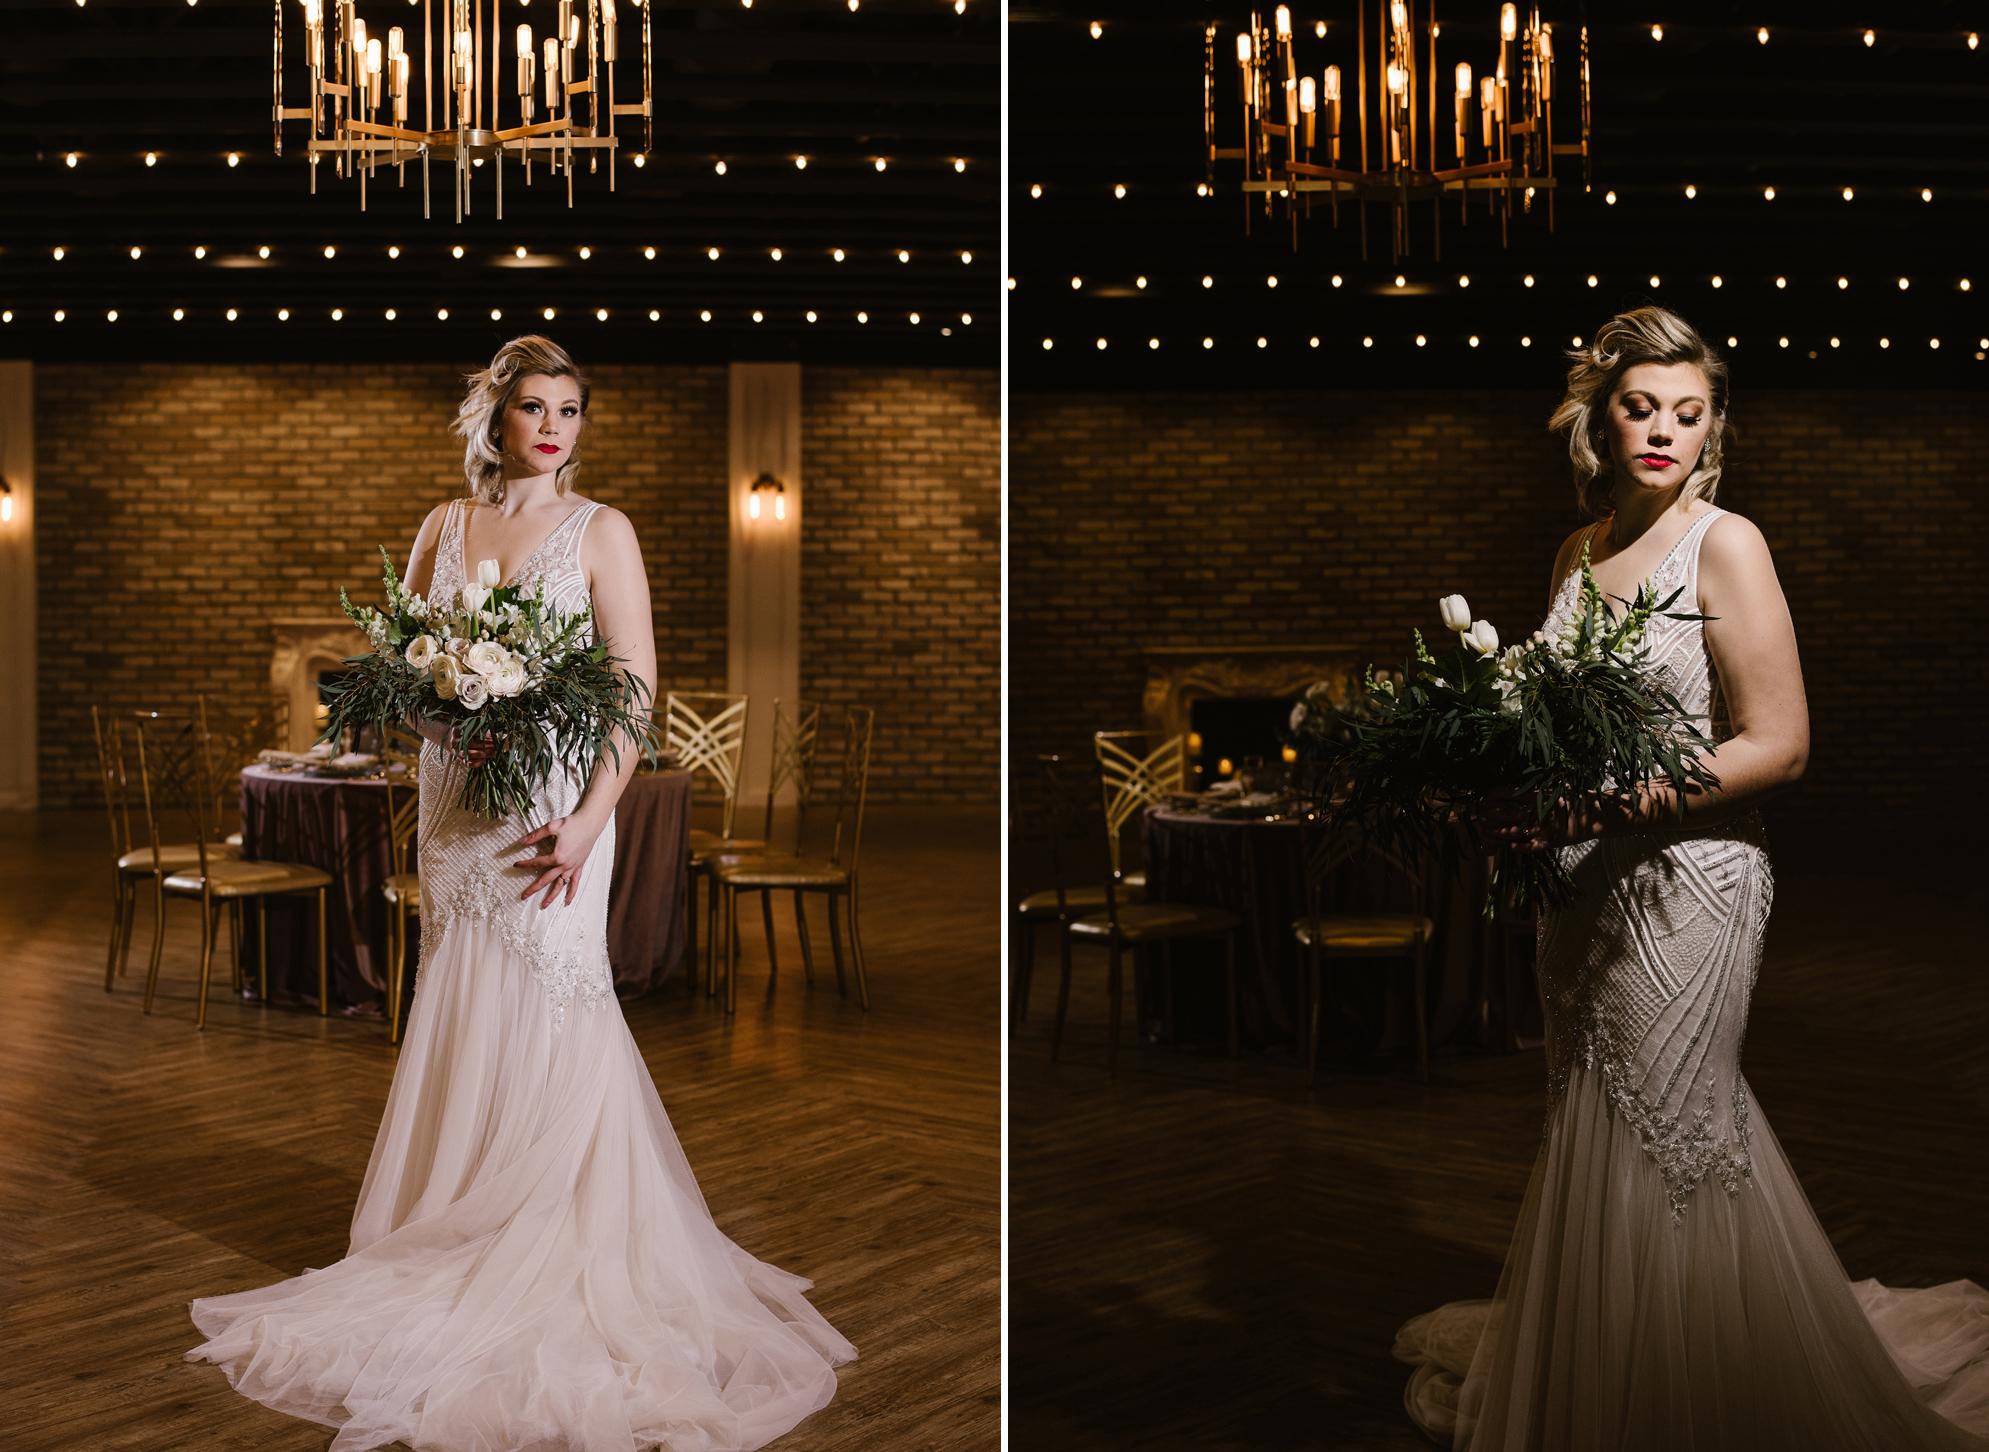 grand-rapids-wedding-photographer-2.jpg